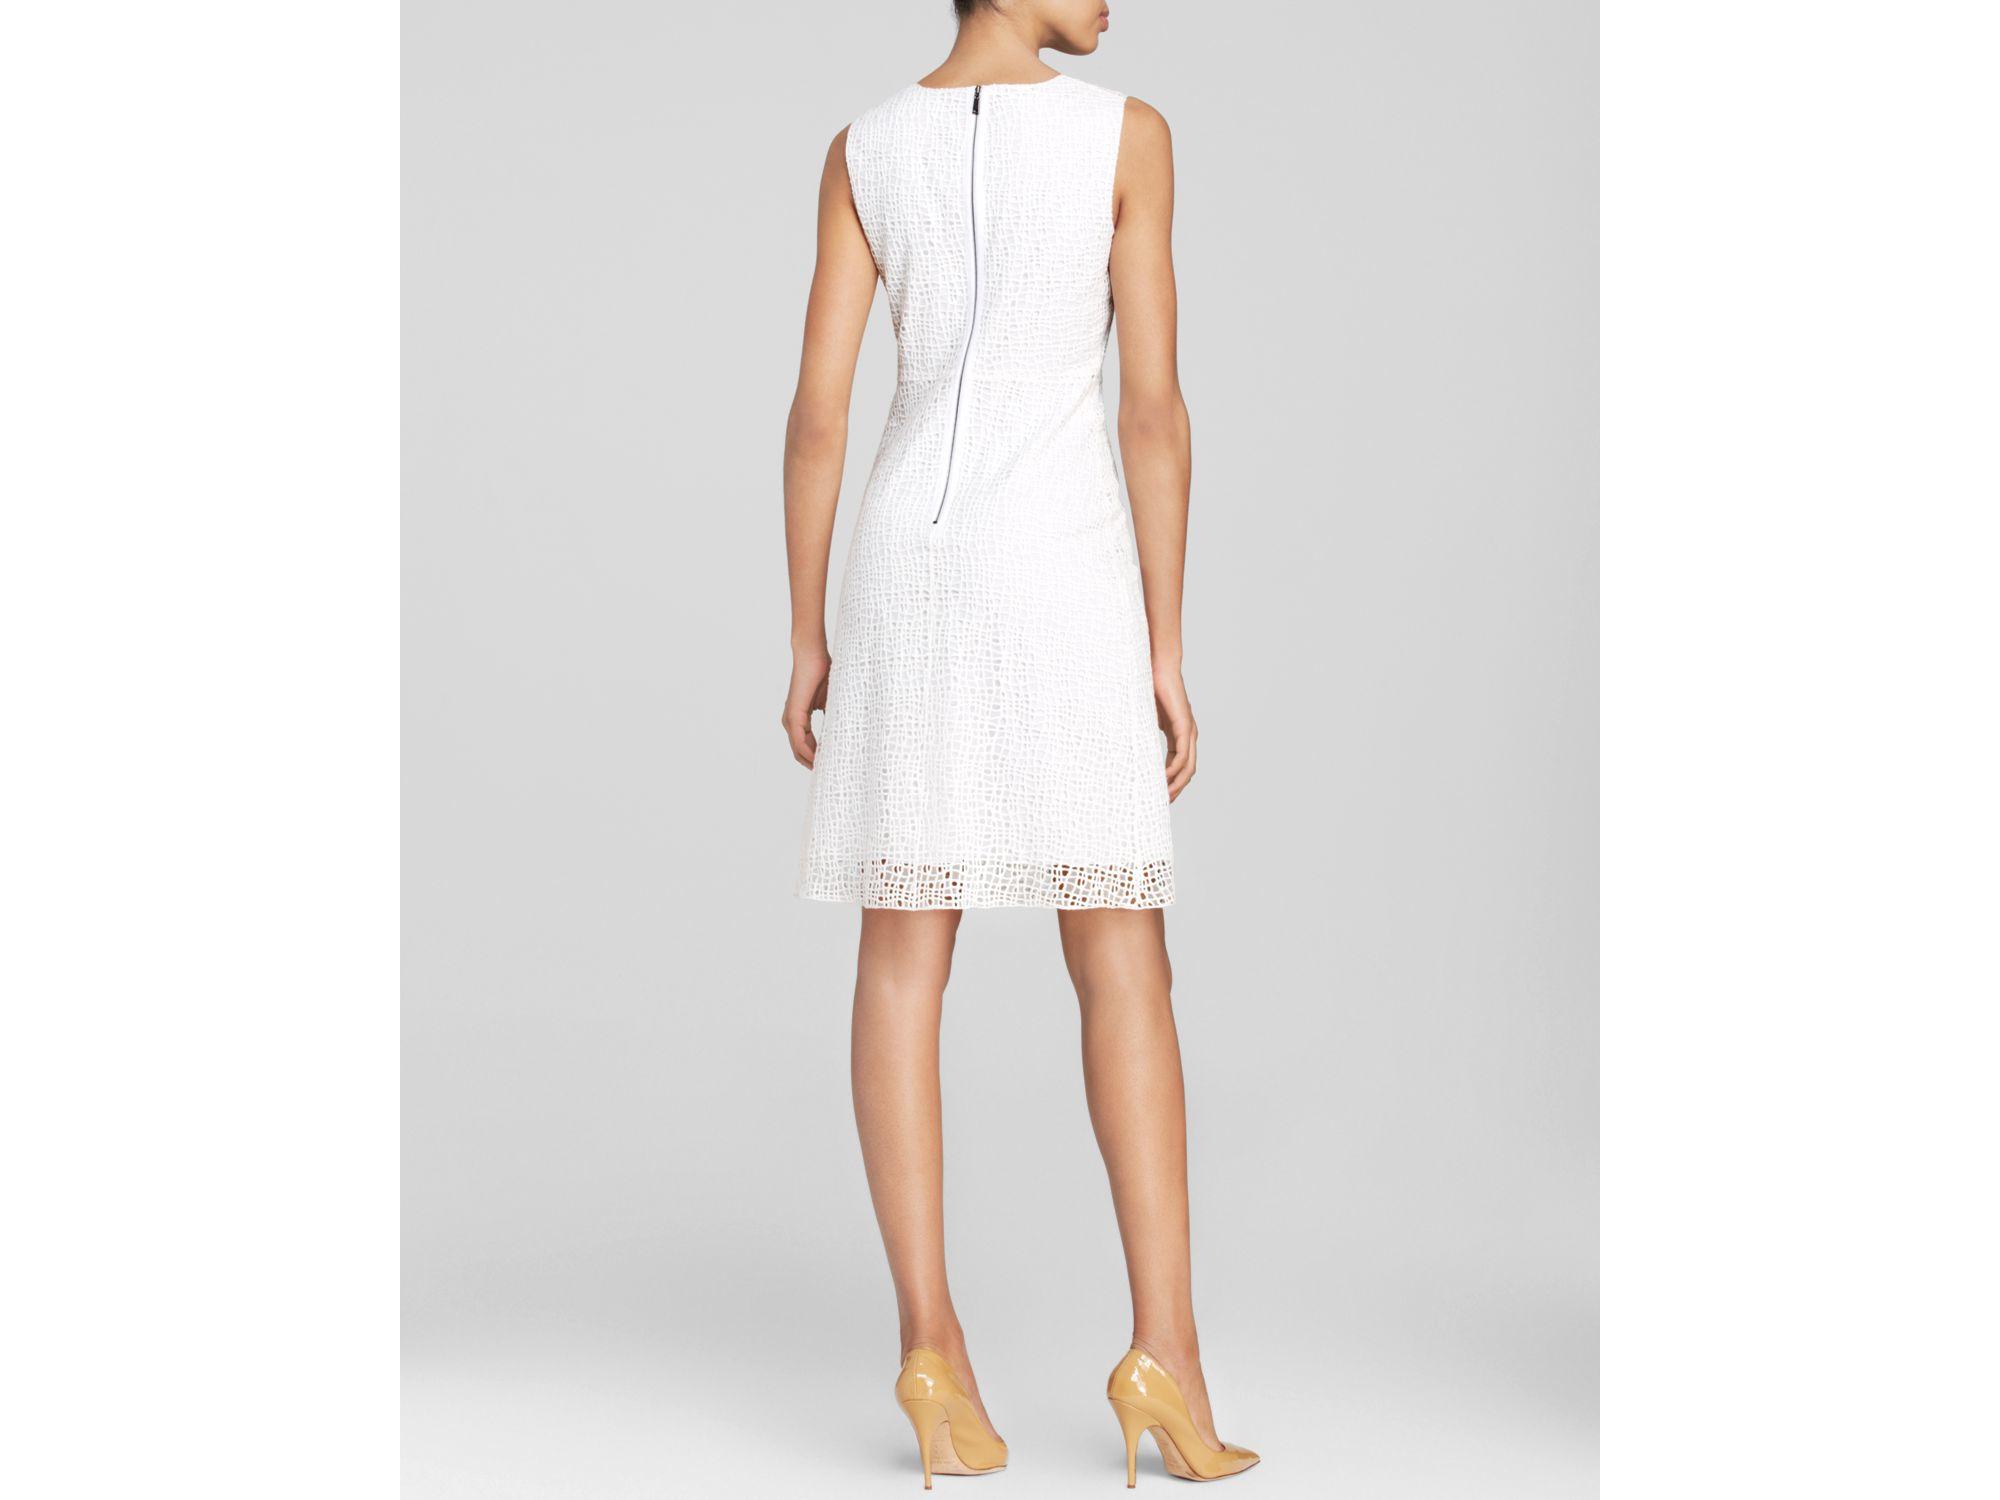 f69493bedf Elie Tahari Dress - Ophelia Sleeveless Lace in White - Lyst